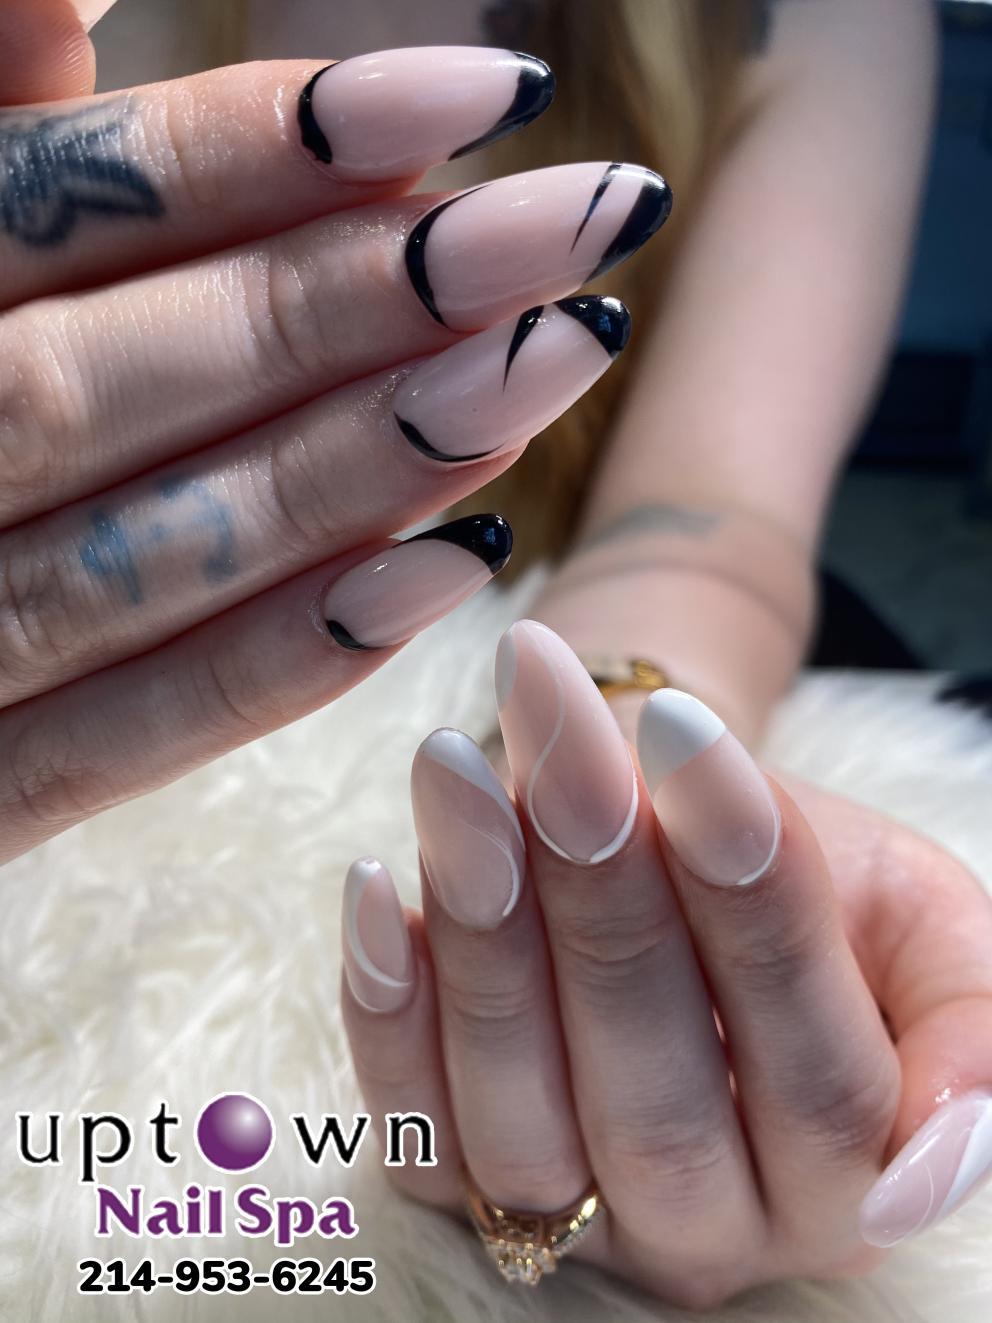 Uptown Nail Spa - Nail salon  DALLAS, TX 75204